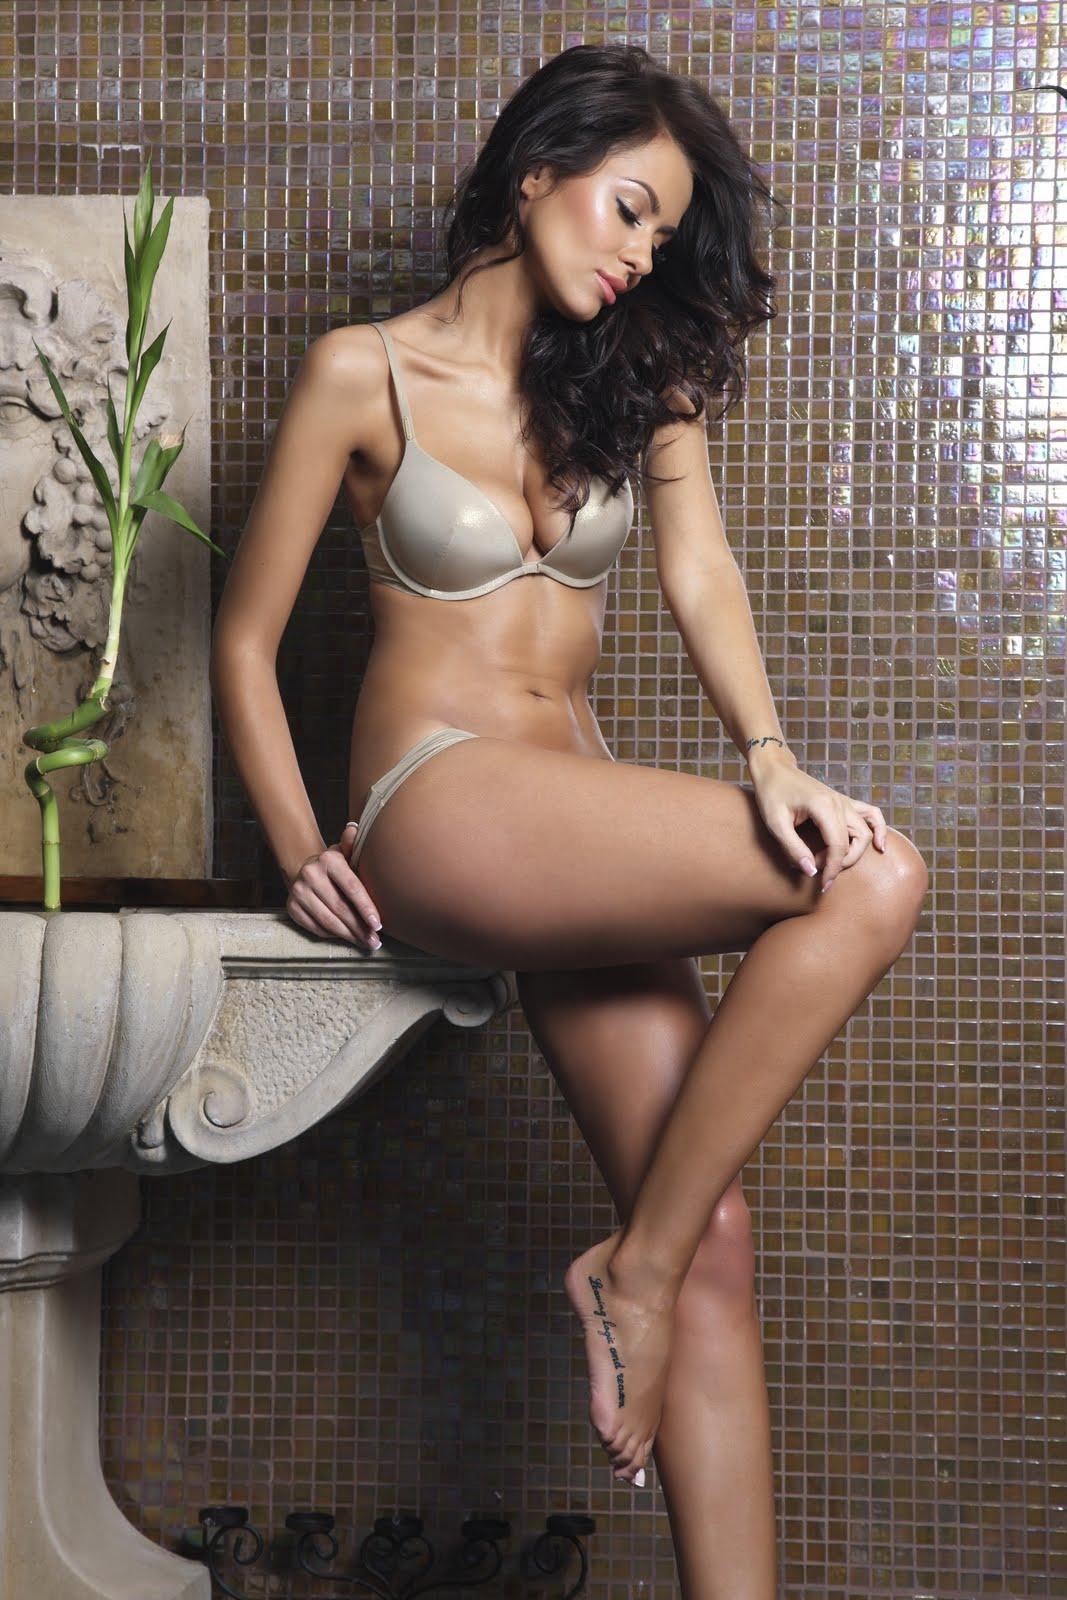 http://2.bp.blogspot.com/-6YLxuwZ6B5M/TfSPG_vyJEI/AAAAAAAAC1Y/JWN5mUhEk8w/s1600/Natalia+Siwiec+hot+wallpaper1.jpg